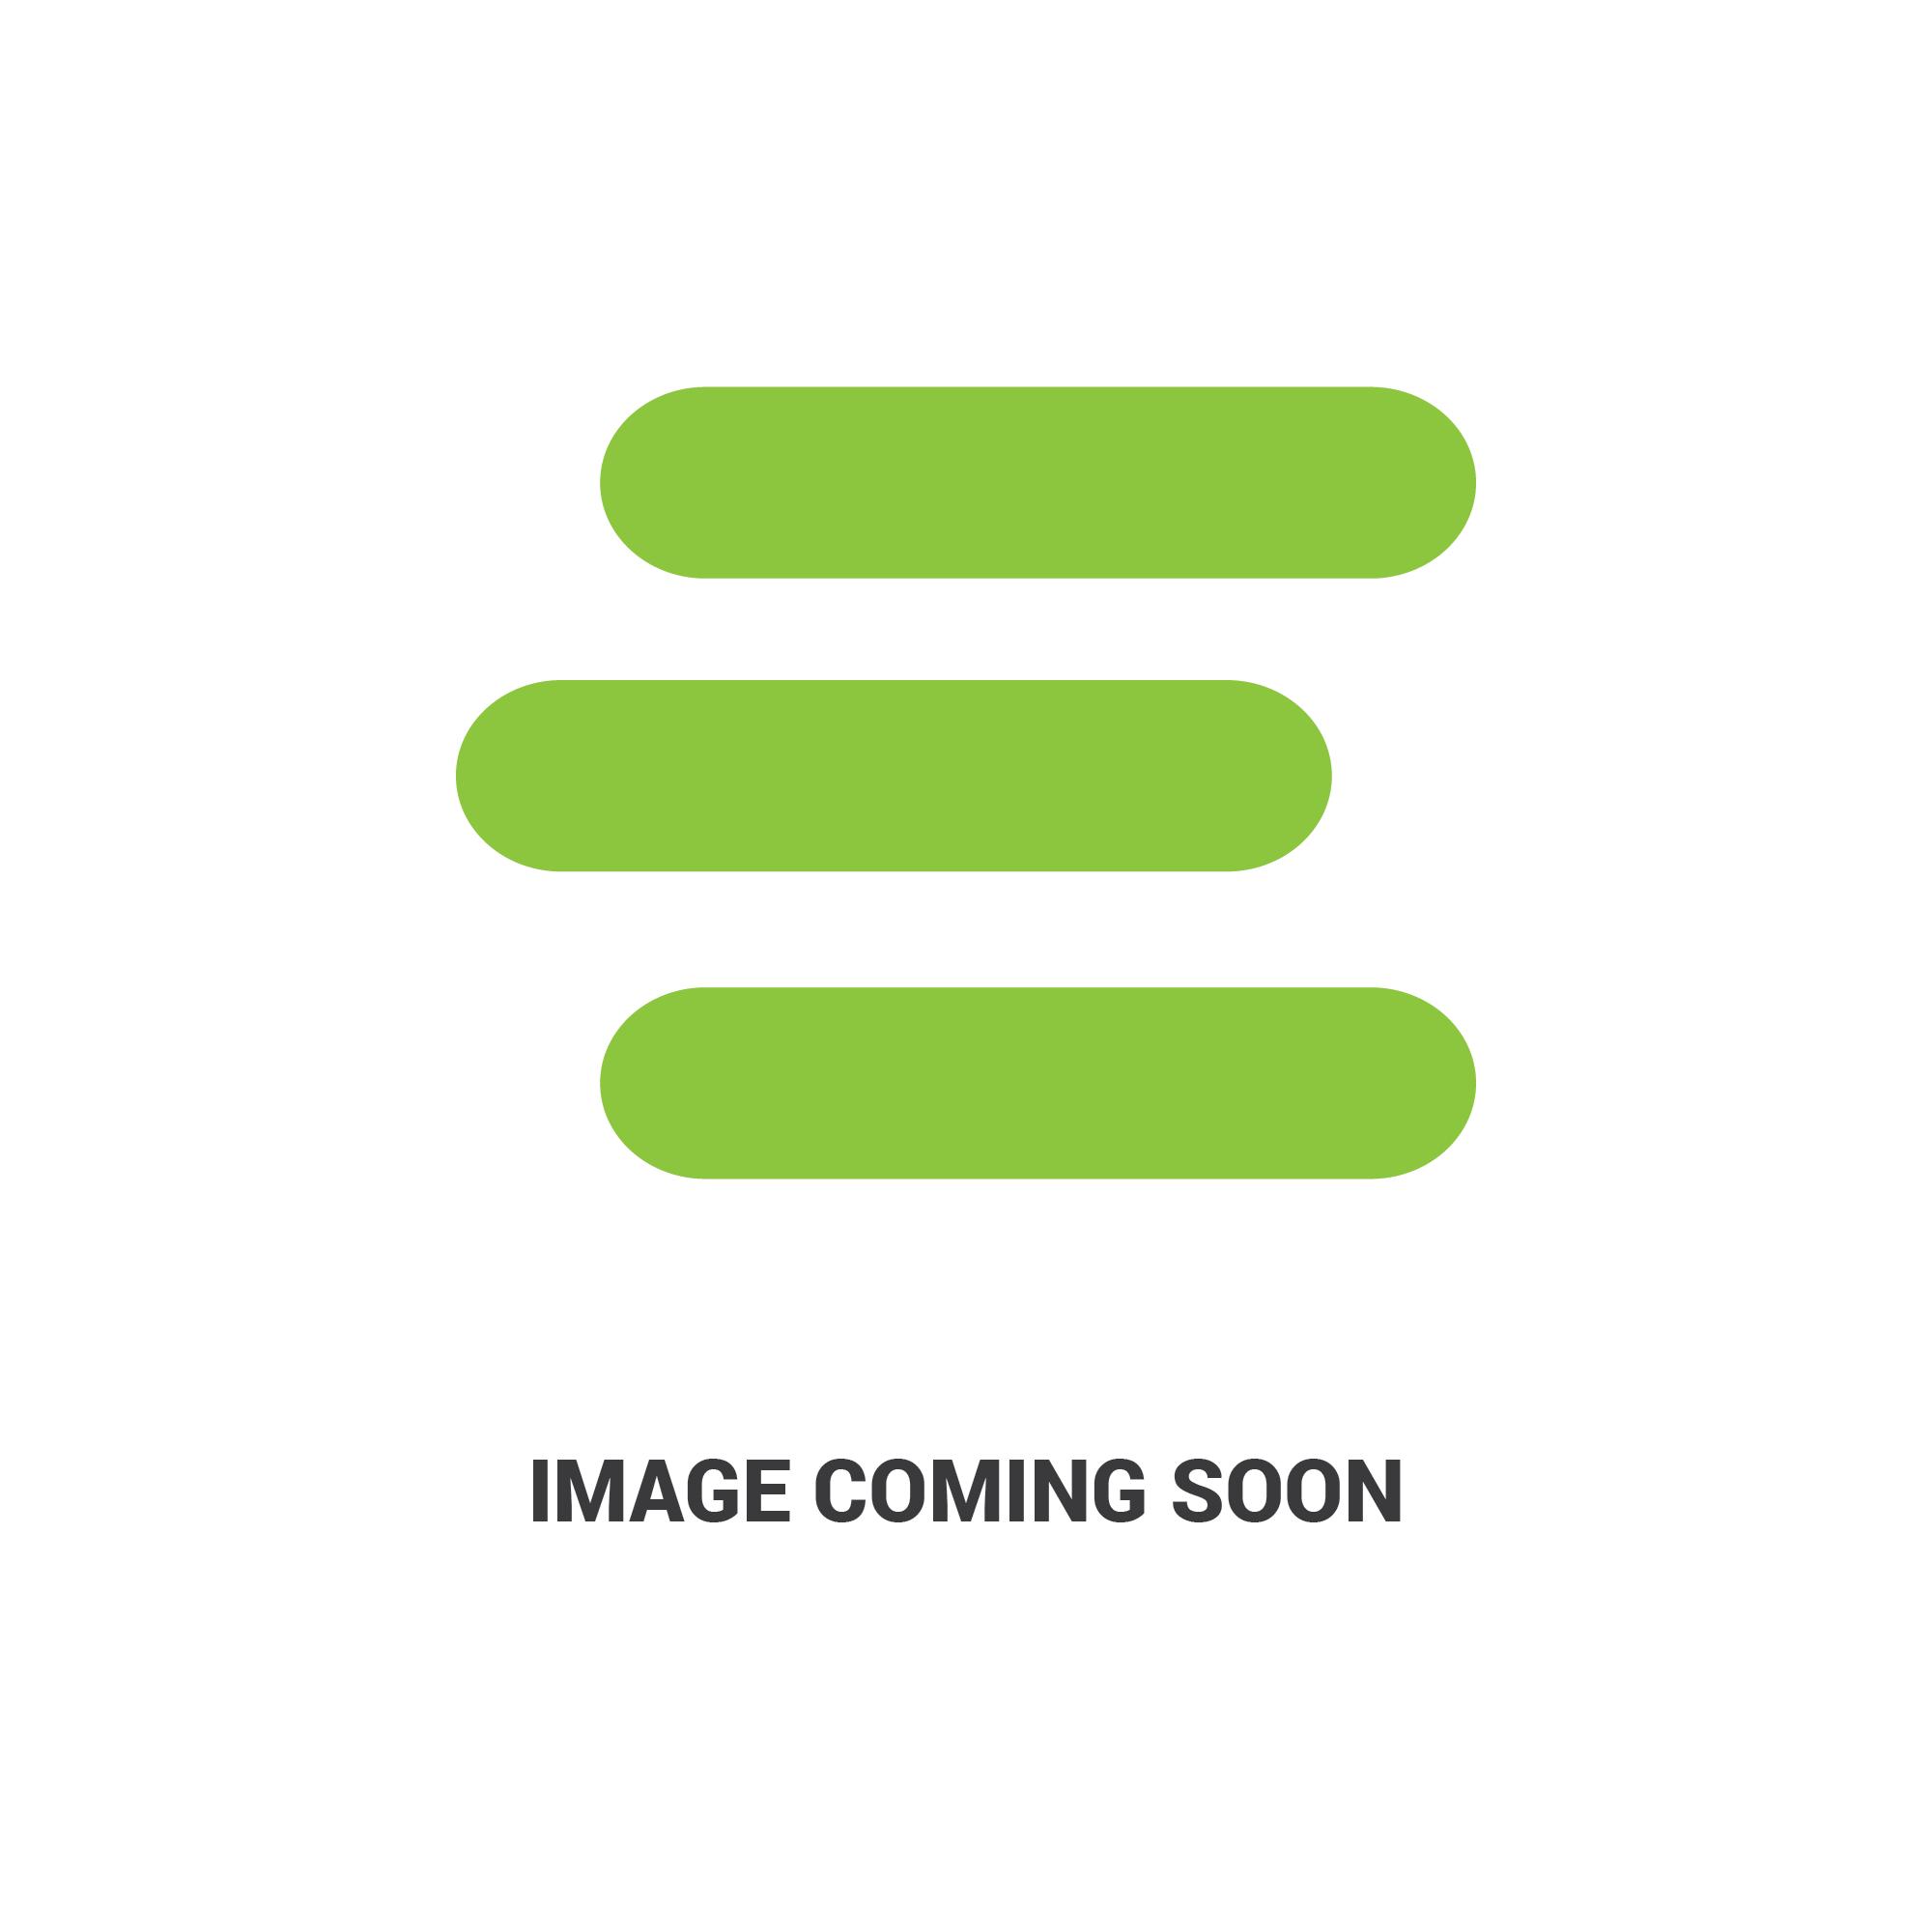 E-SJ327692289_1 .jpg